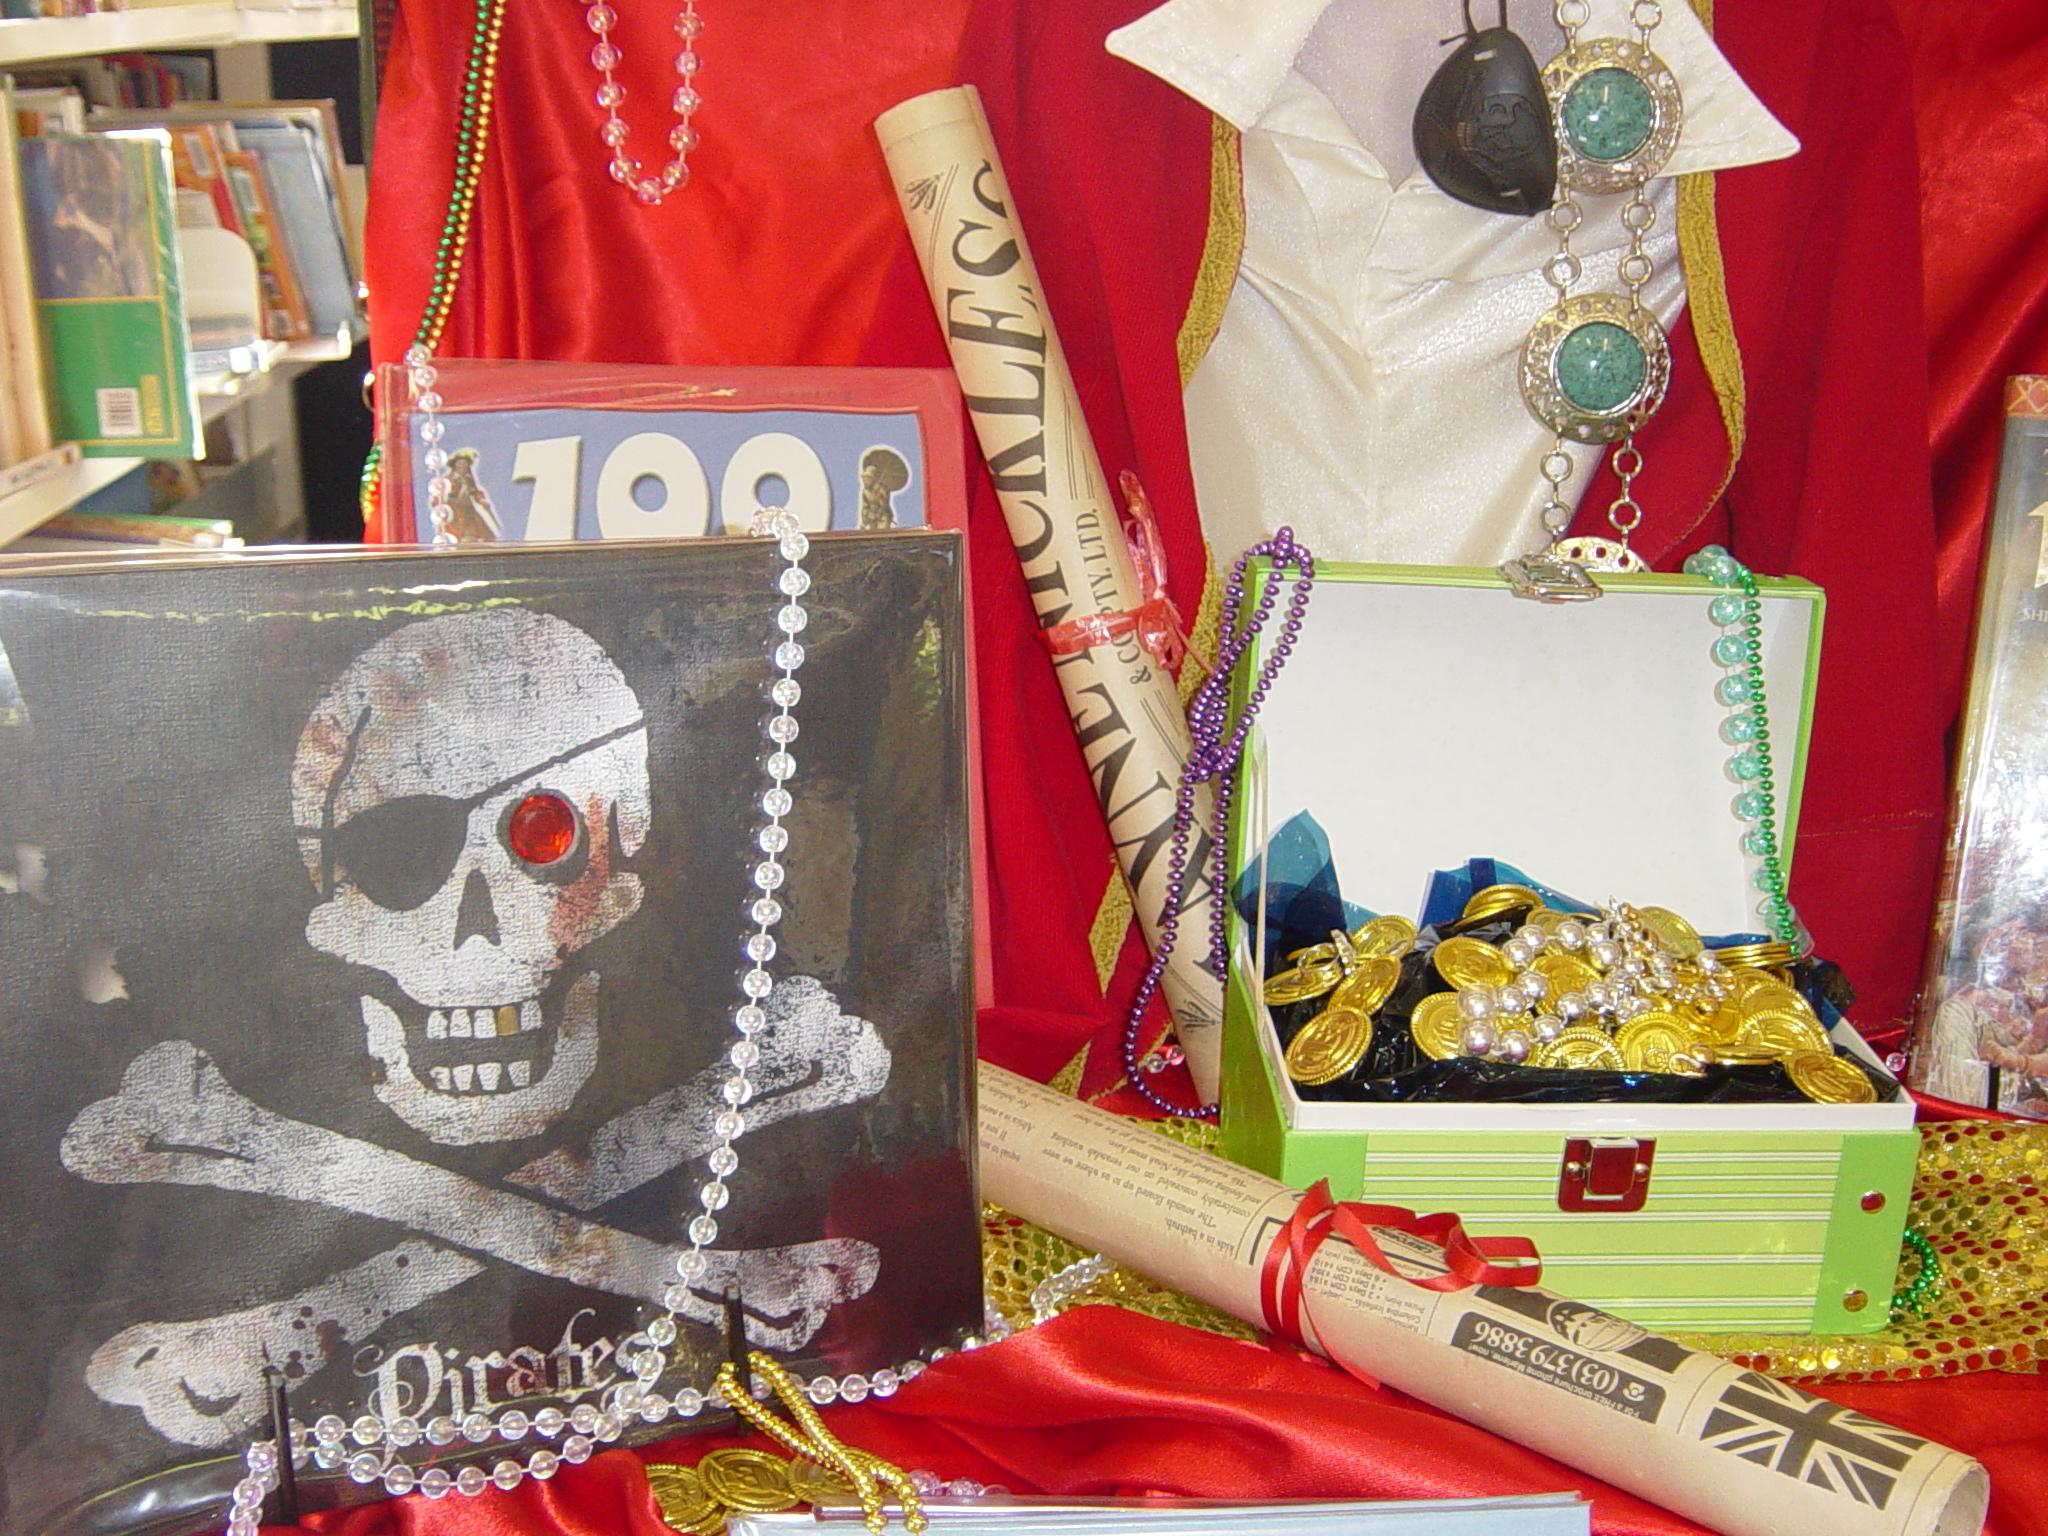 Pirates display